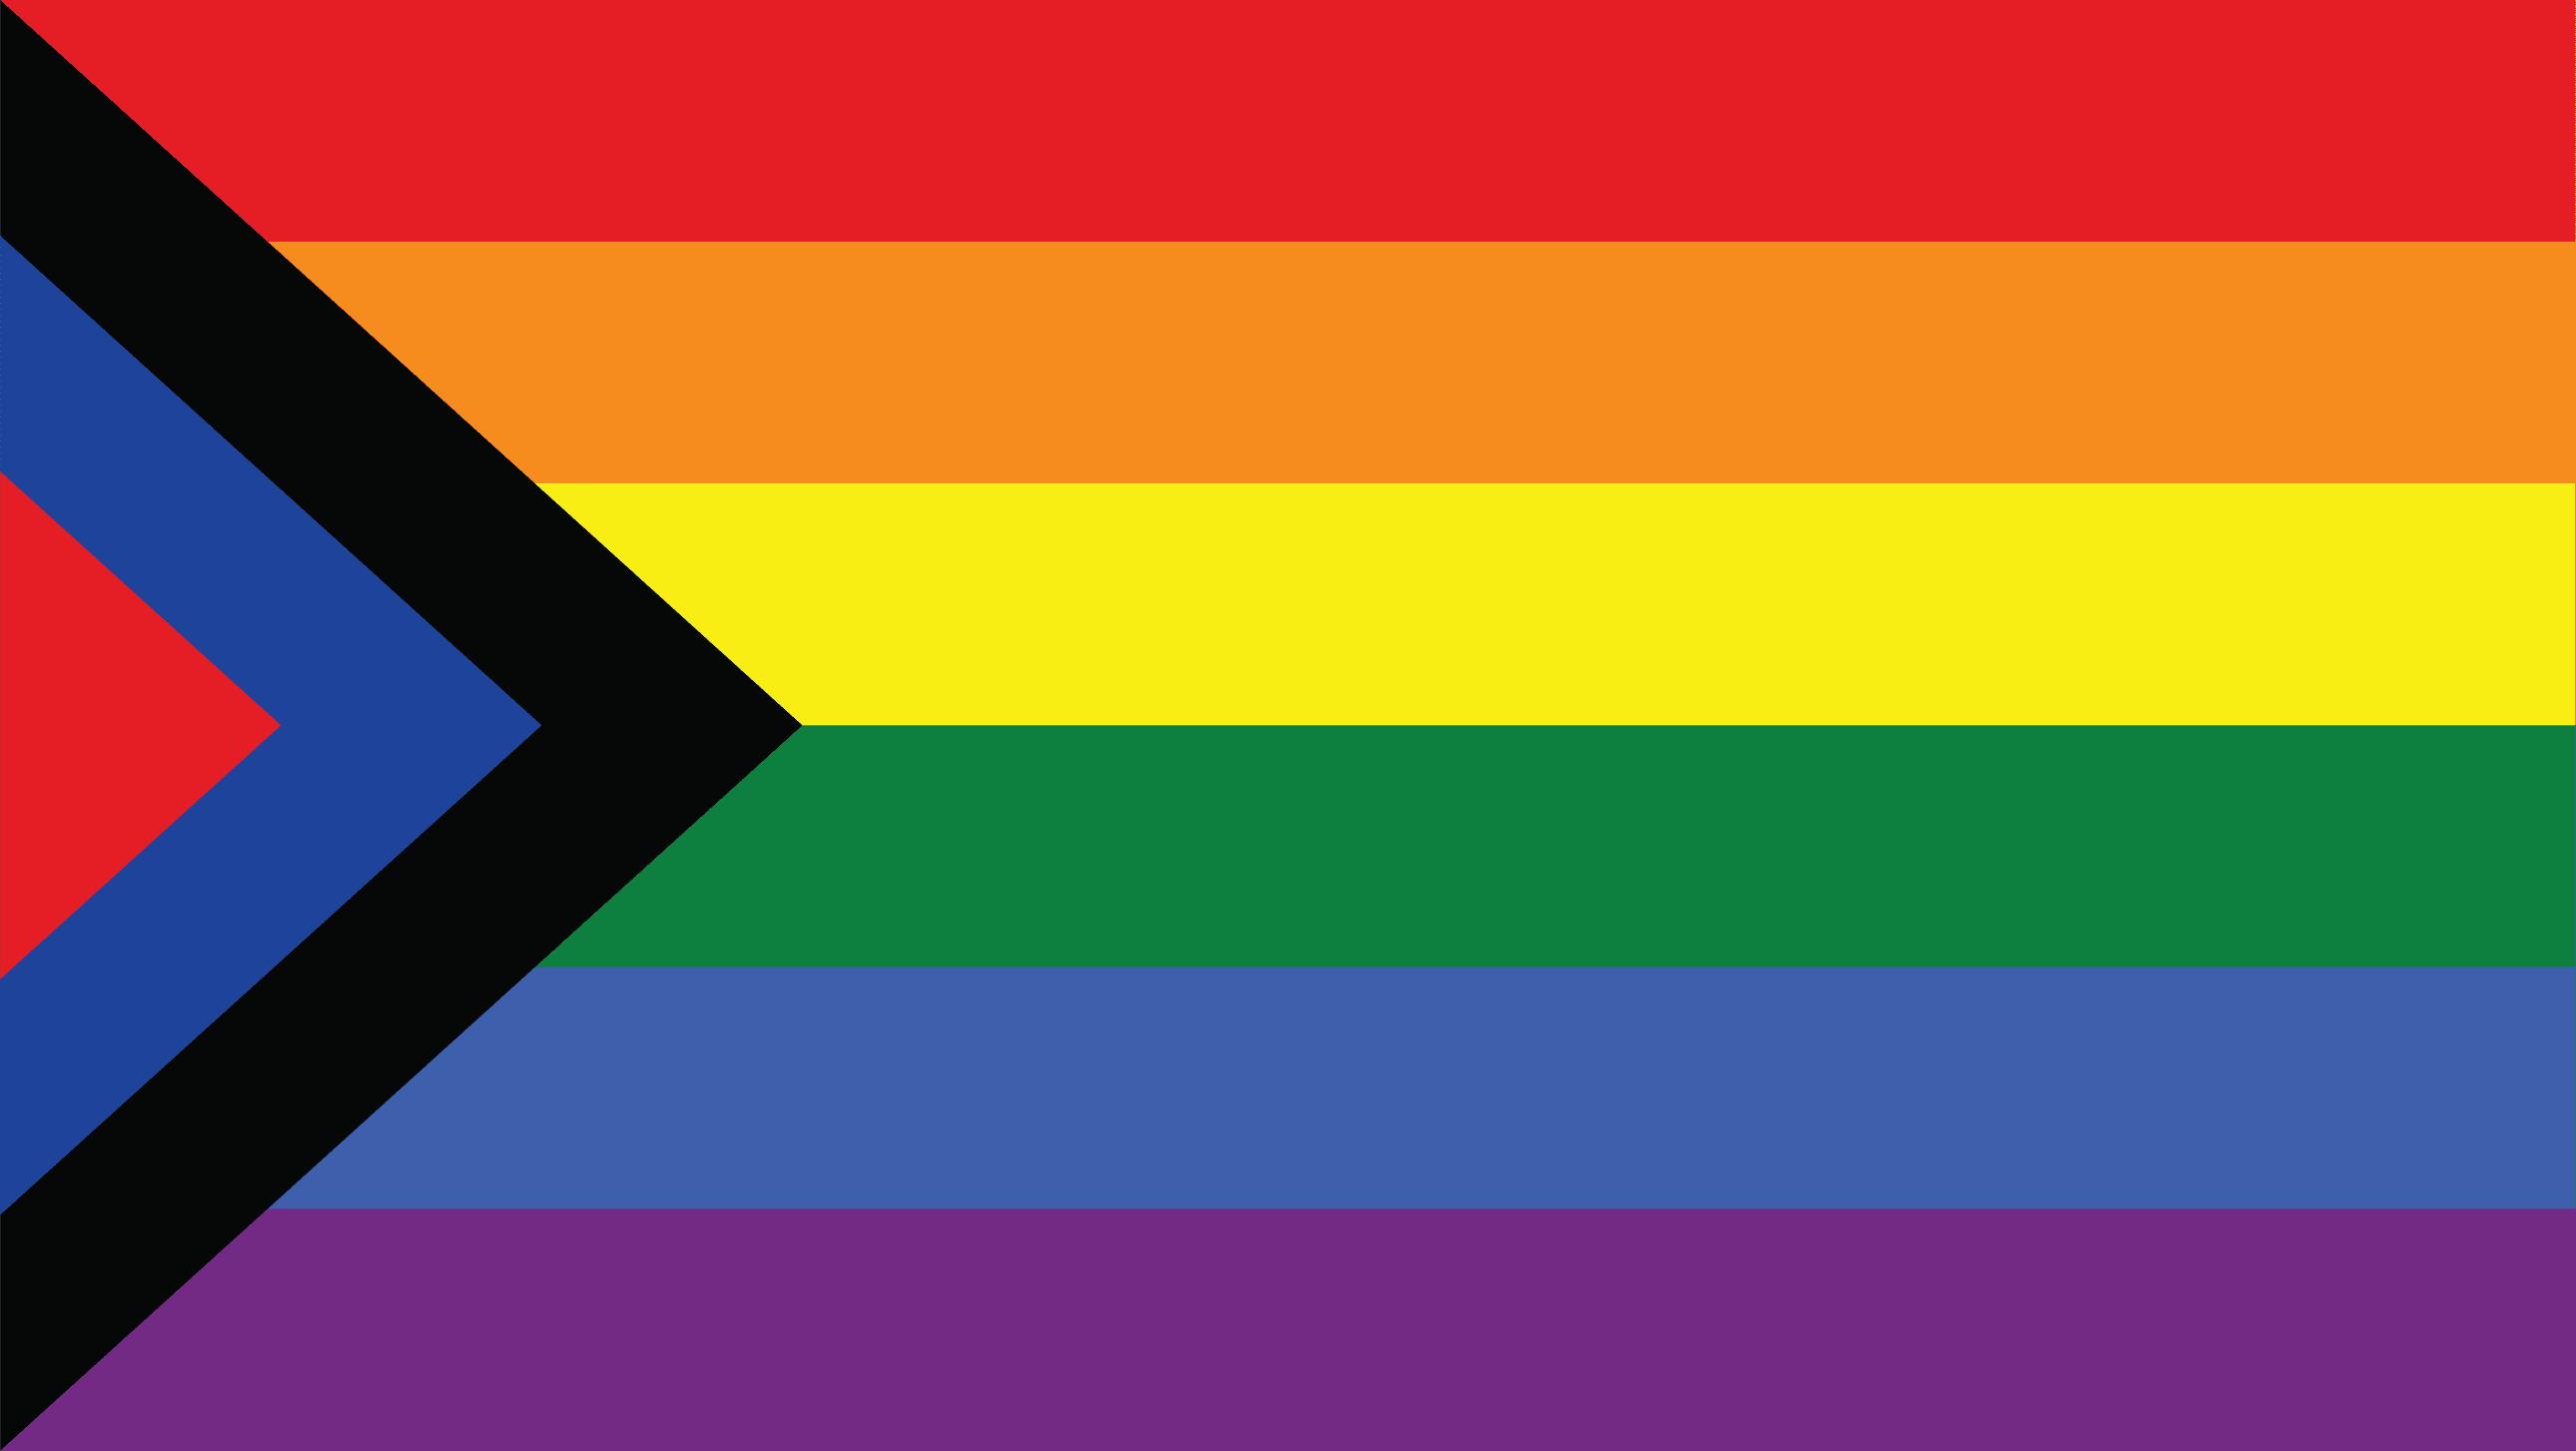 Cannabis Legalization & Social Justice. Striped flag.